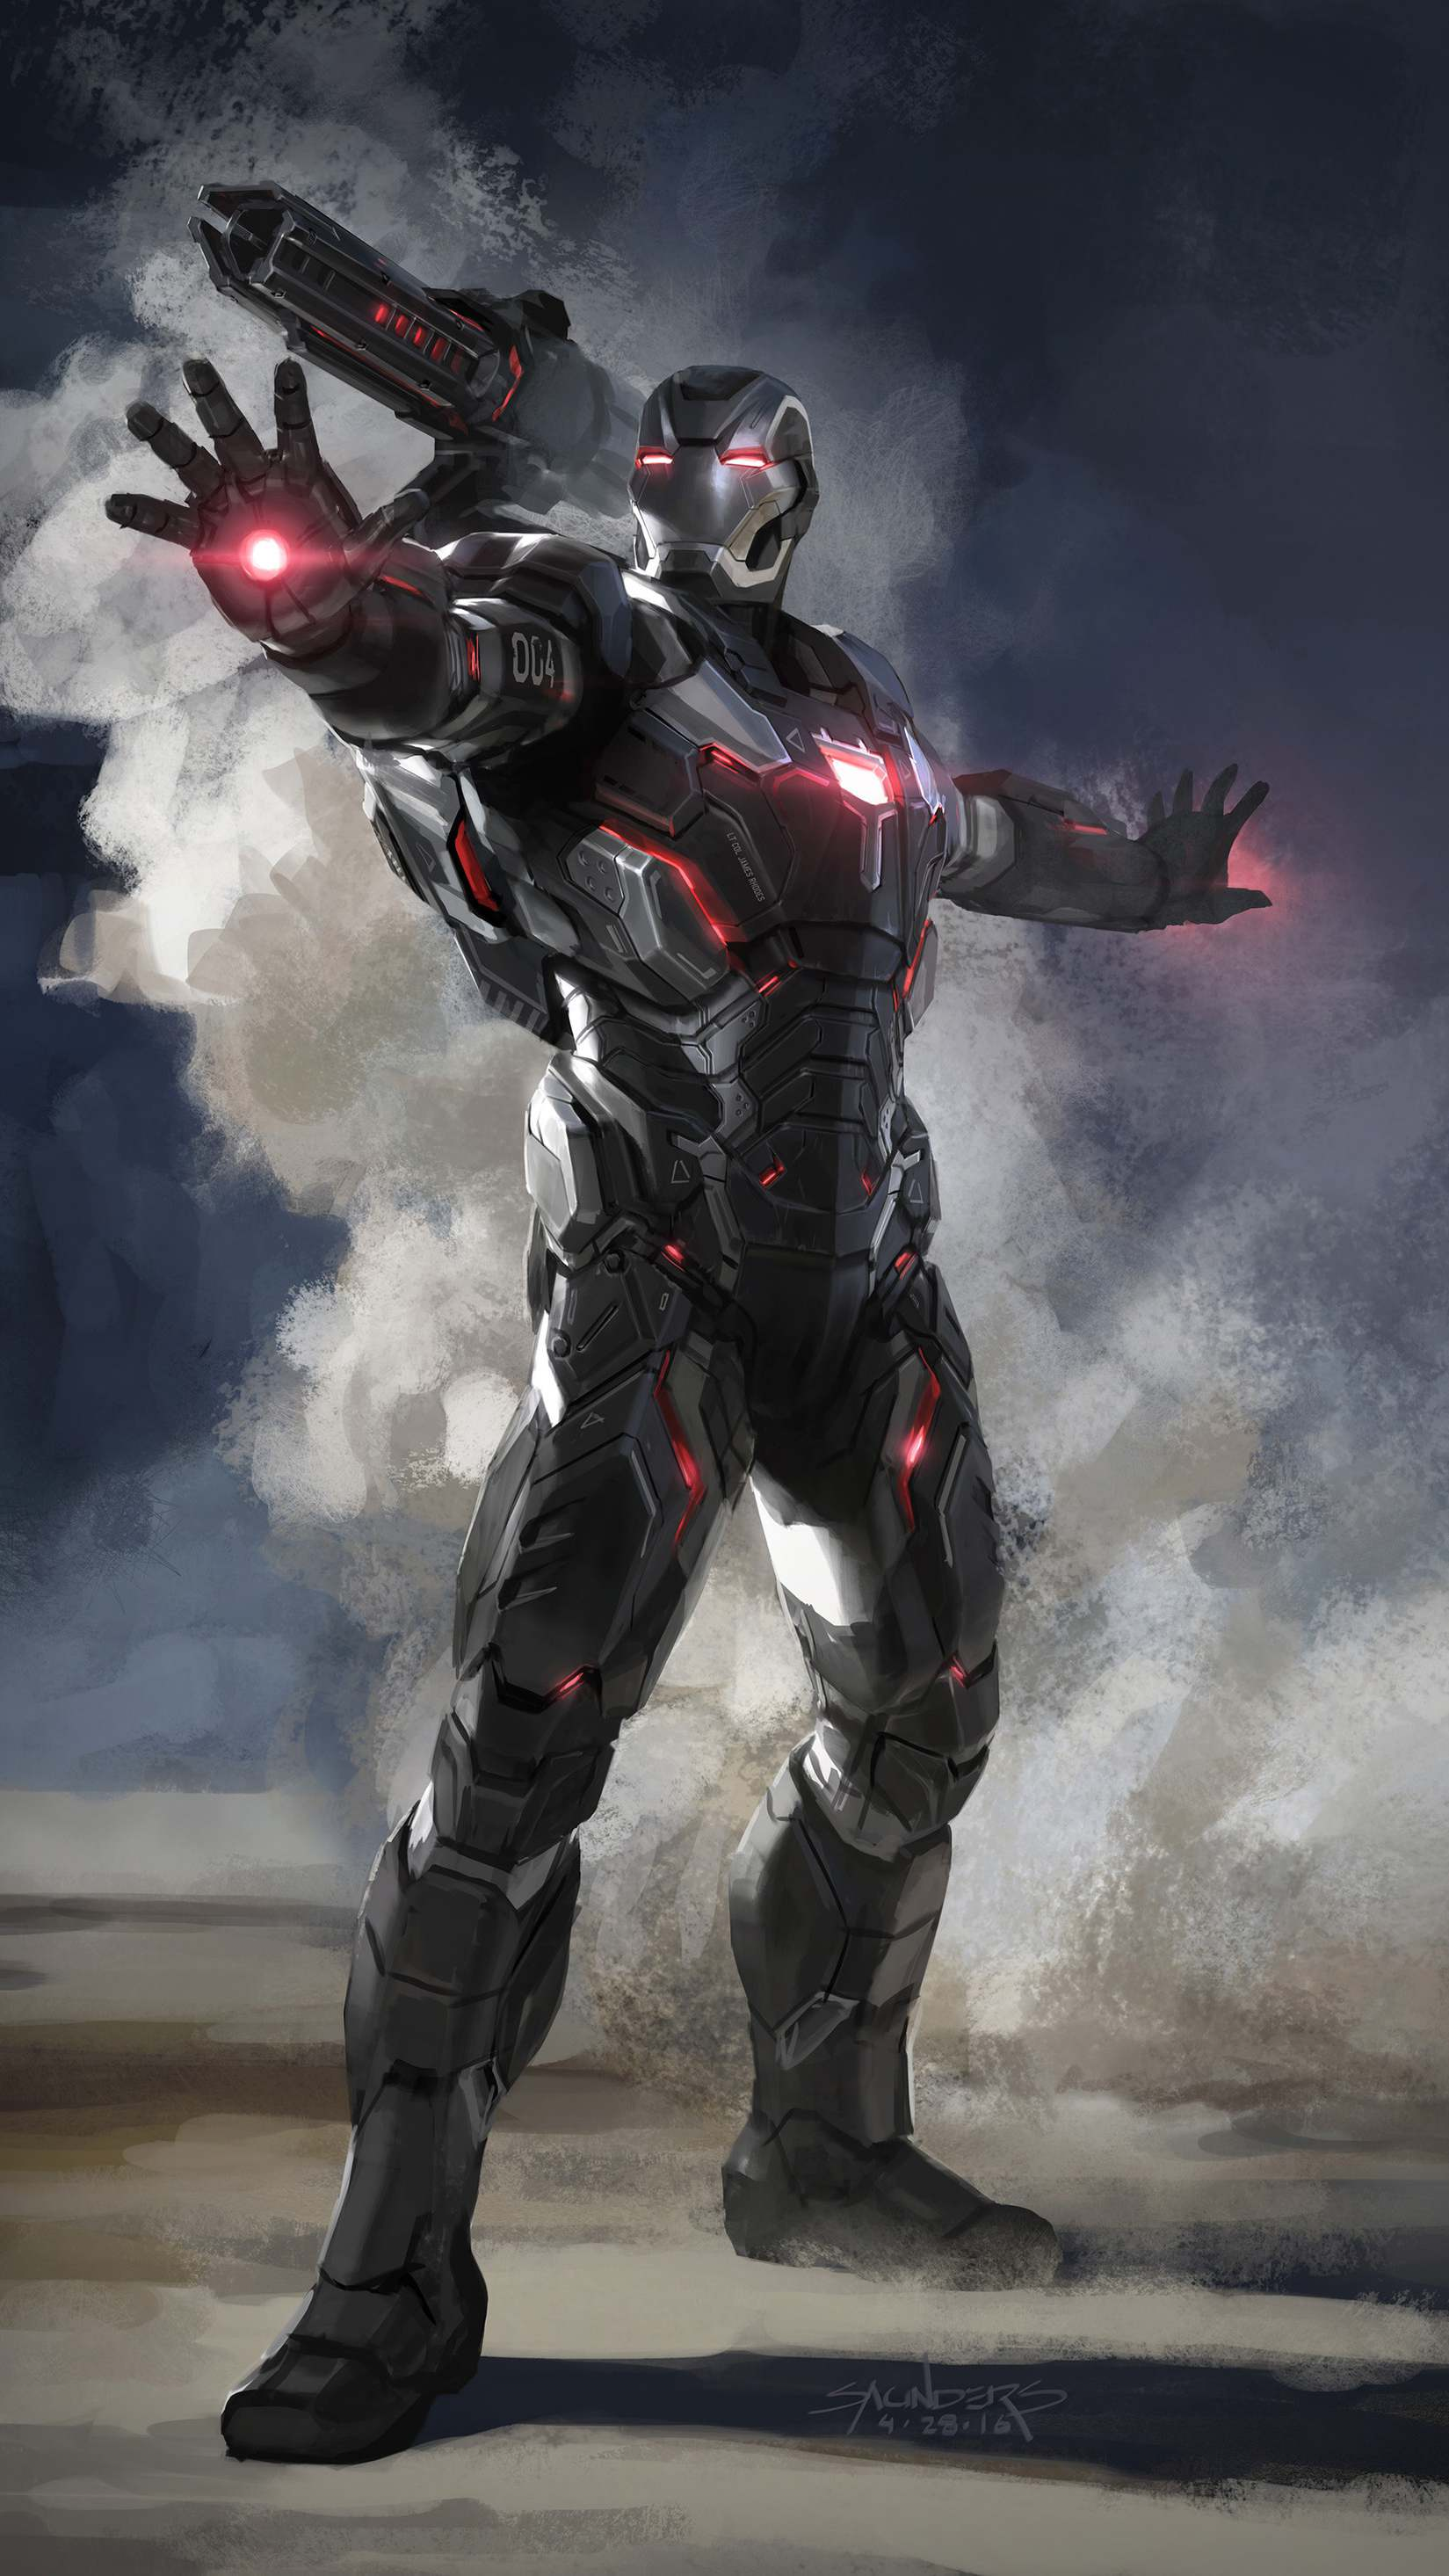 Avengers Endgame War Machine Armor iPhone Wallpaper